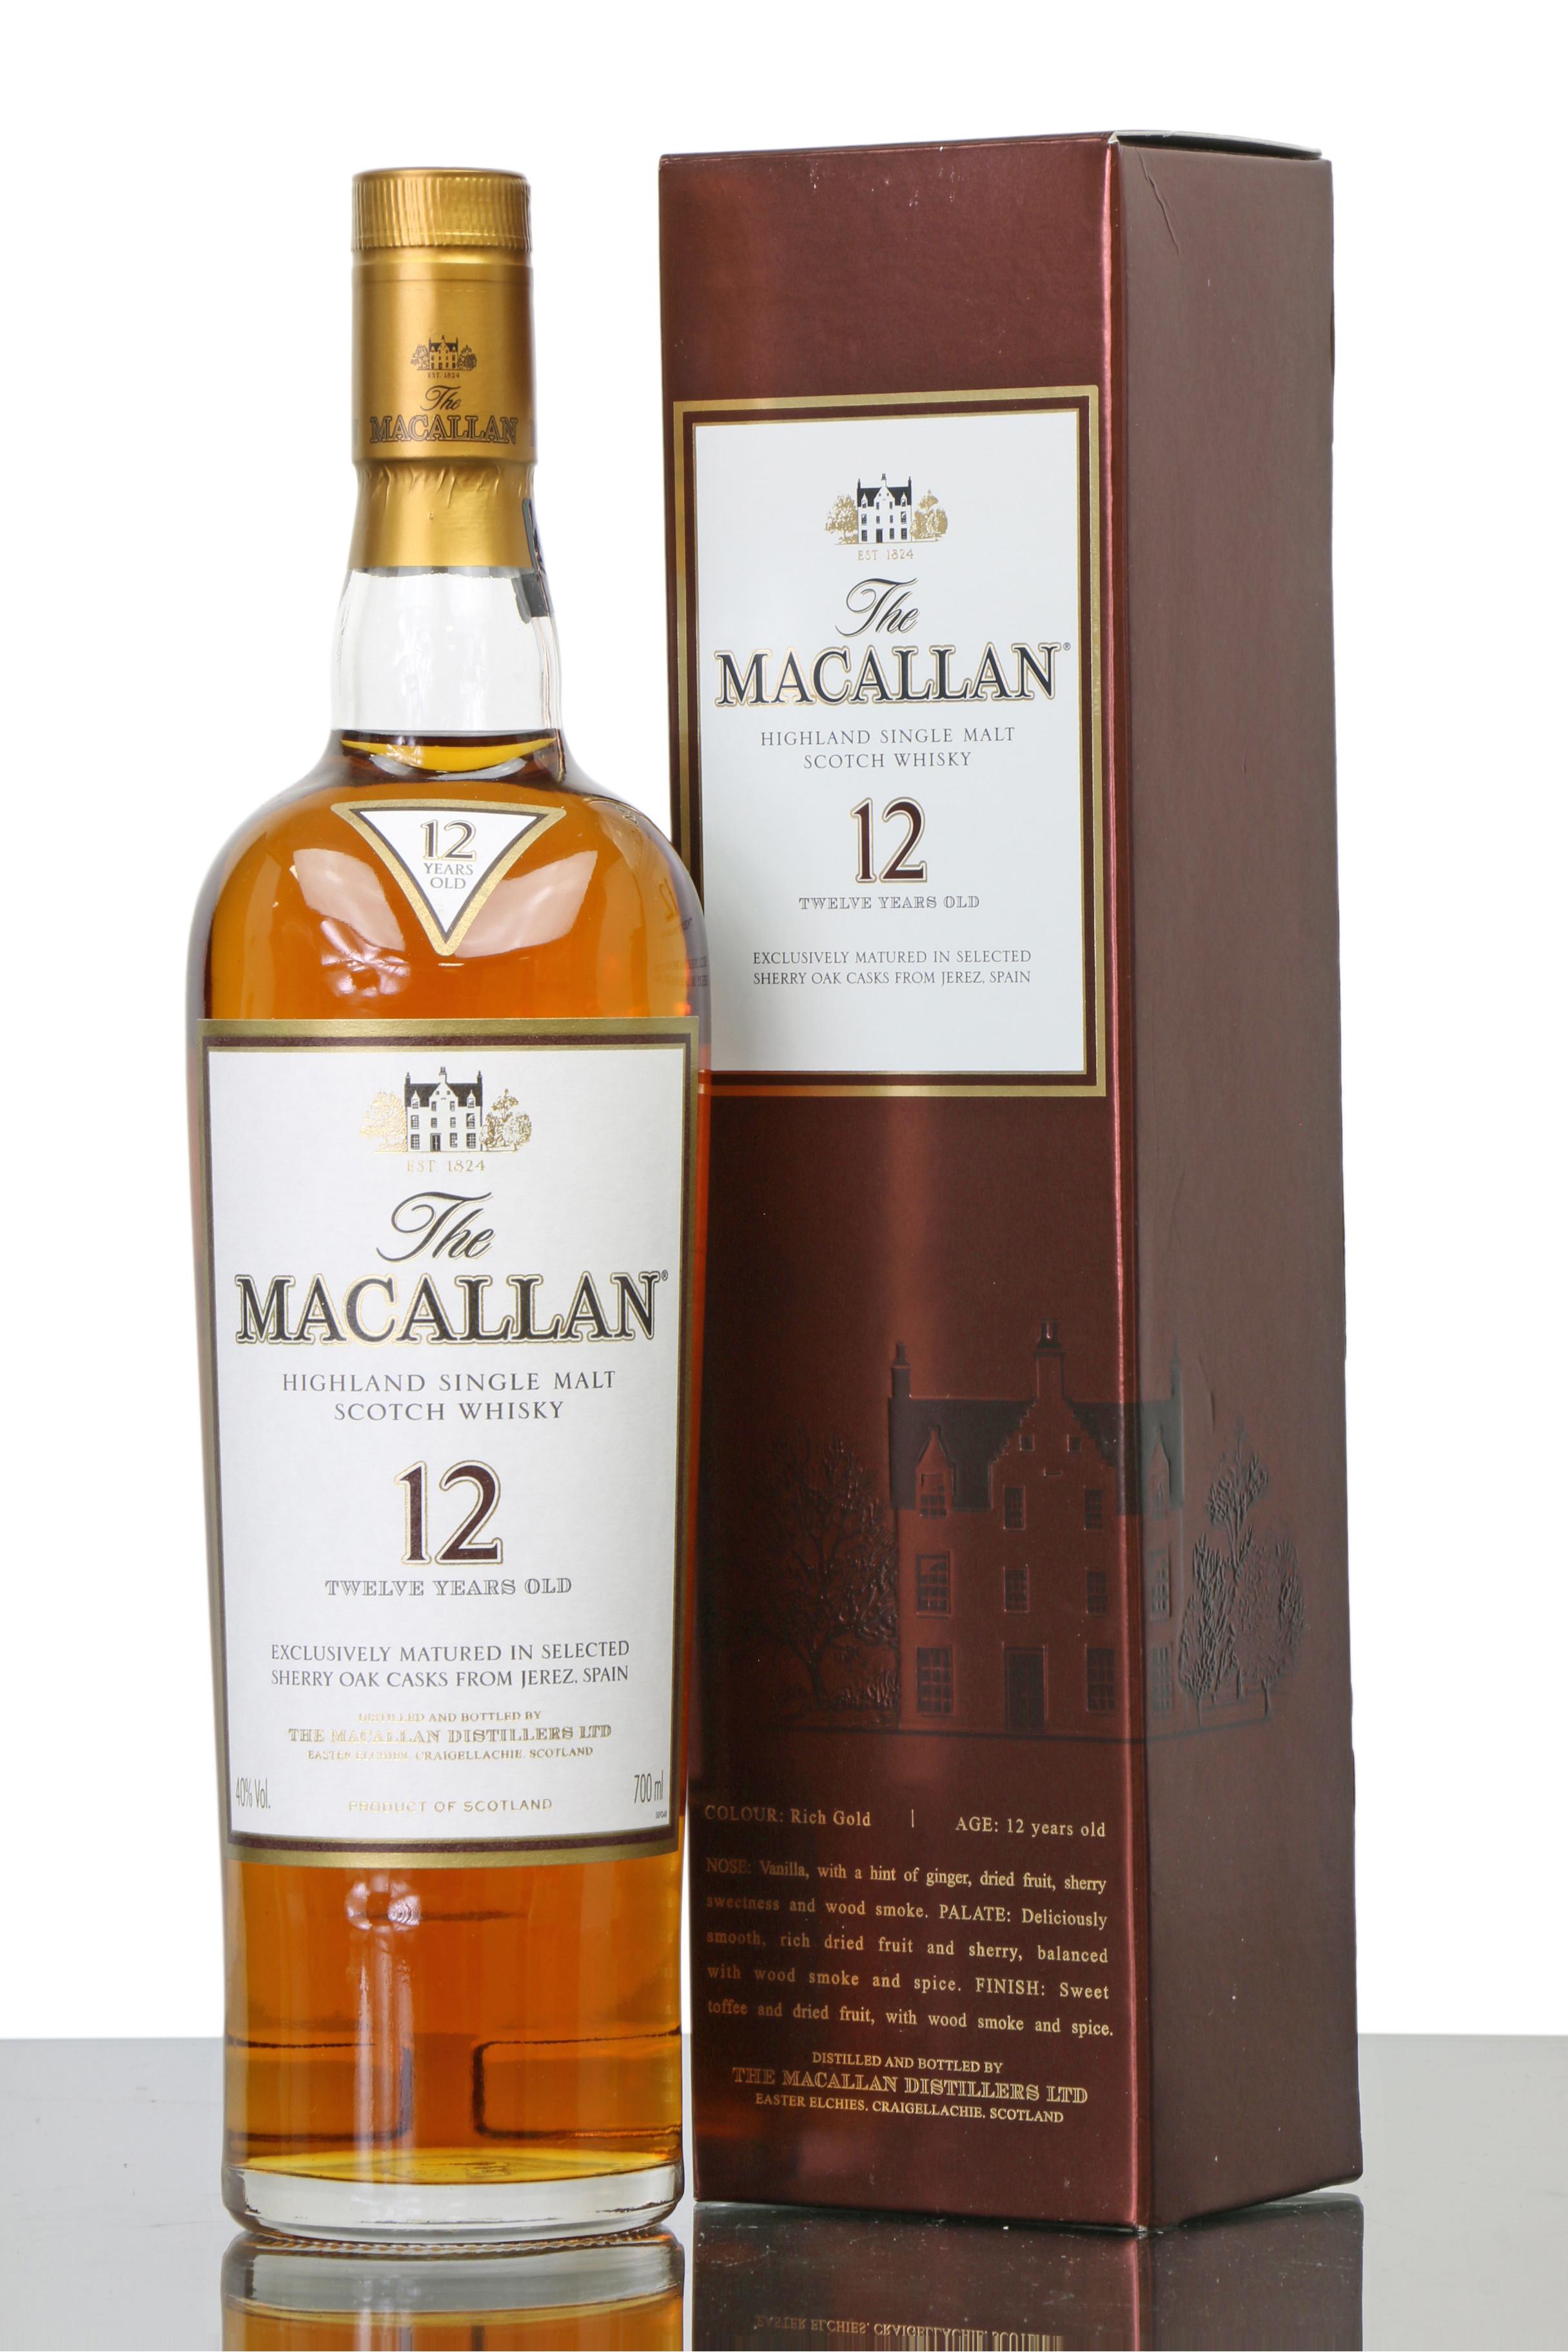 Macallan 12 YO - The Boogaloo Bali